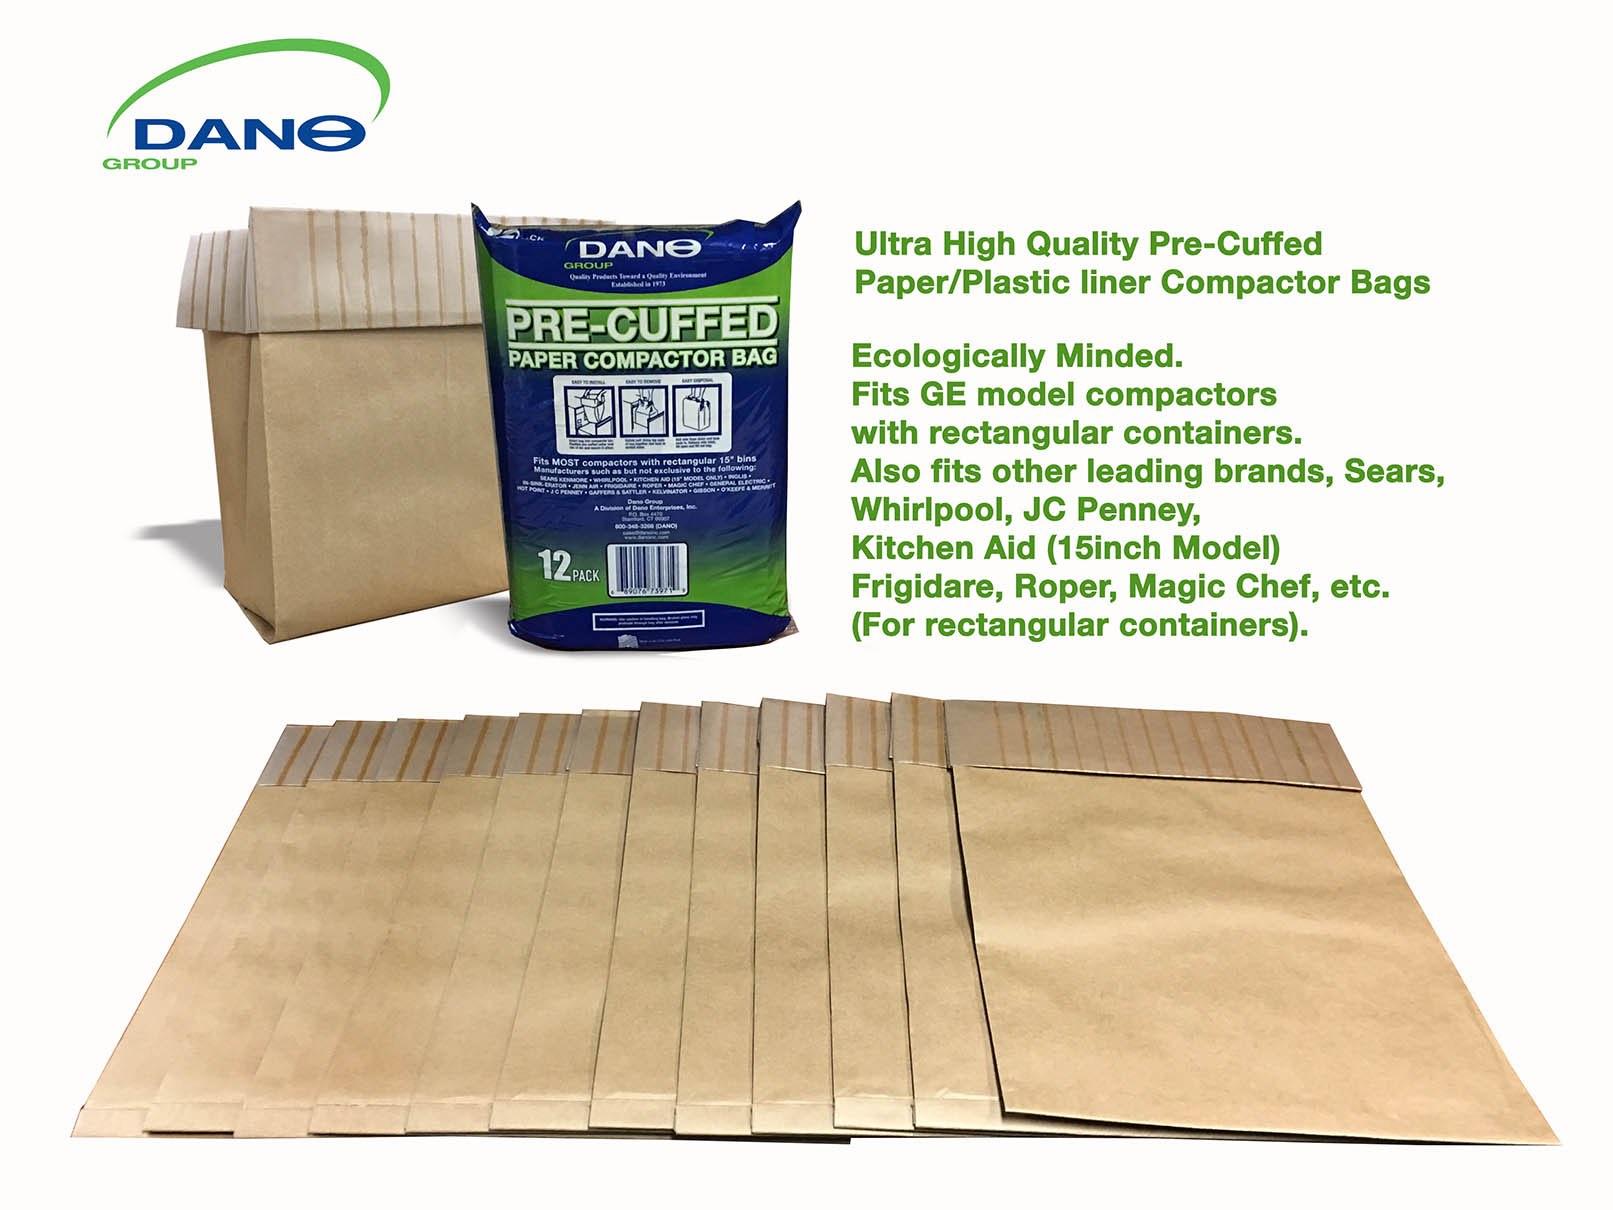 Precuffed Paper Compactor Bag